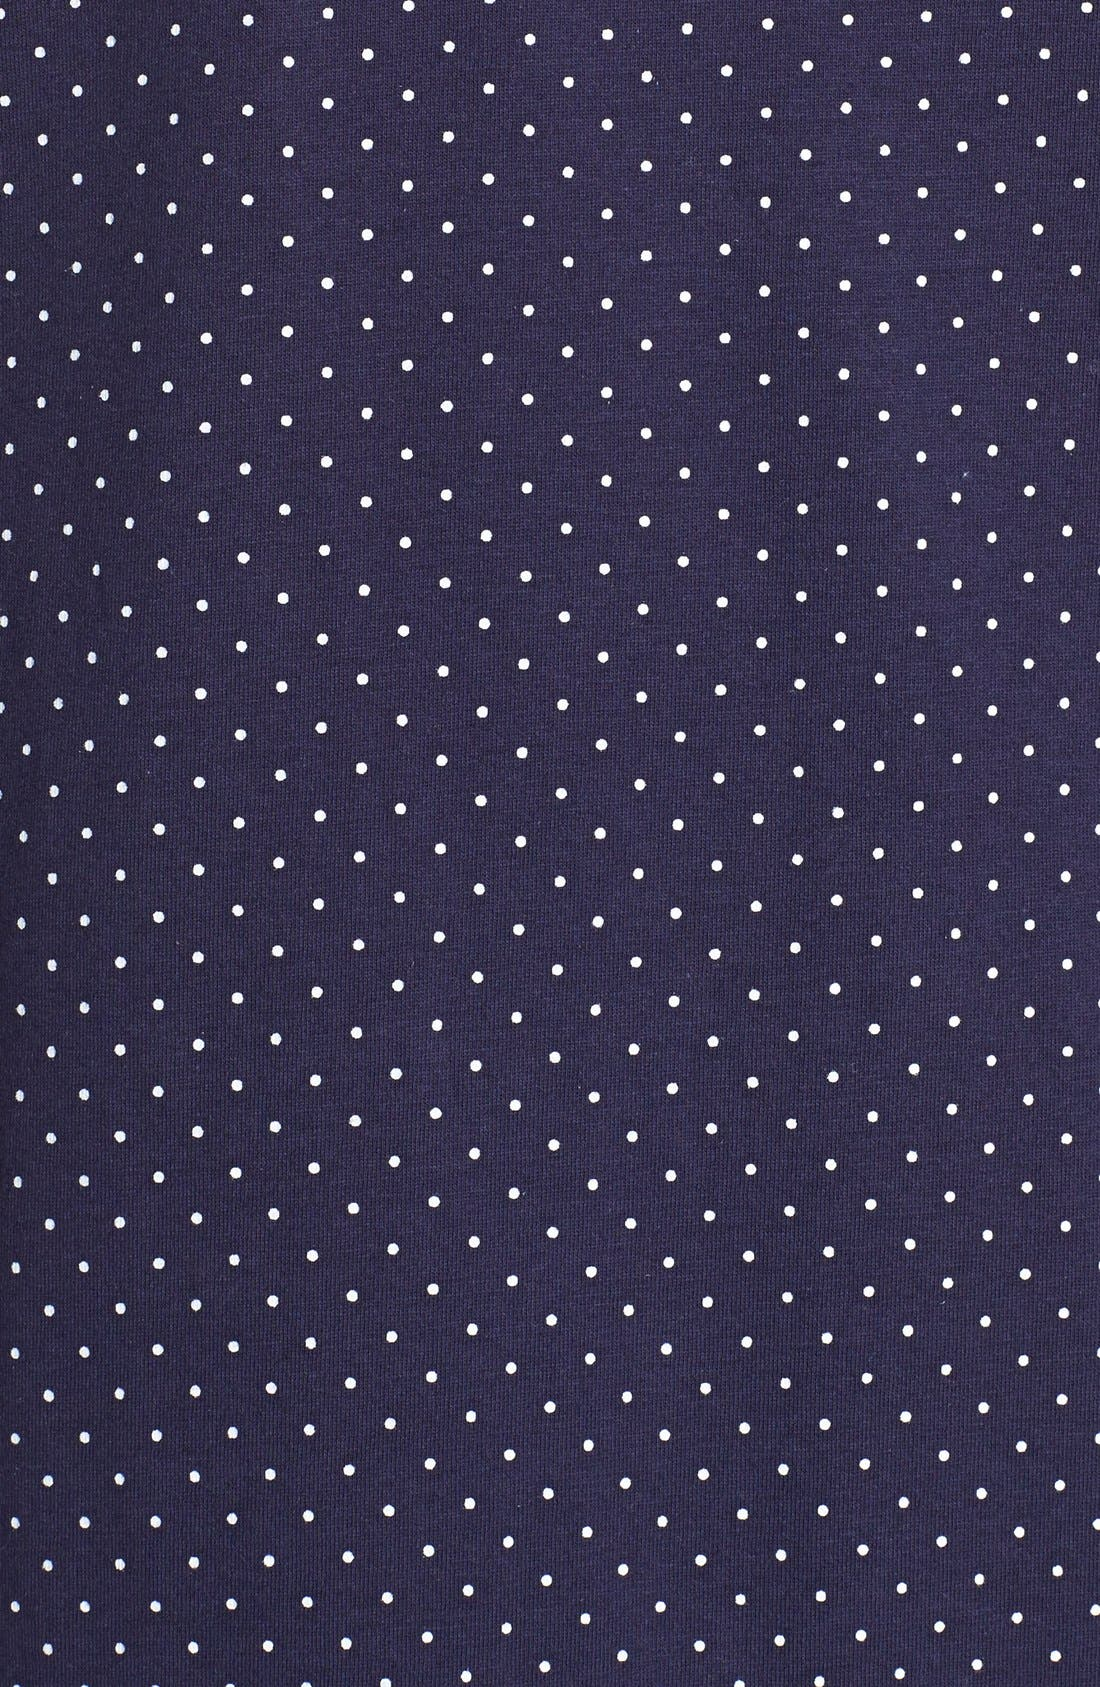 Jersey Sleep Shirt,                             Alternate thumbnail 48, color,